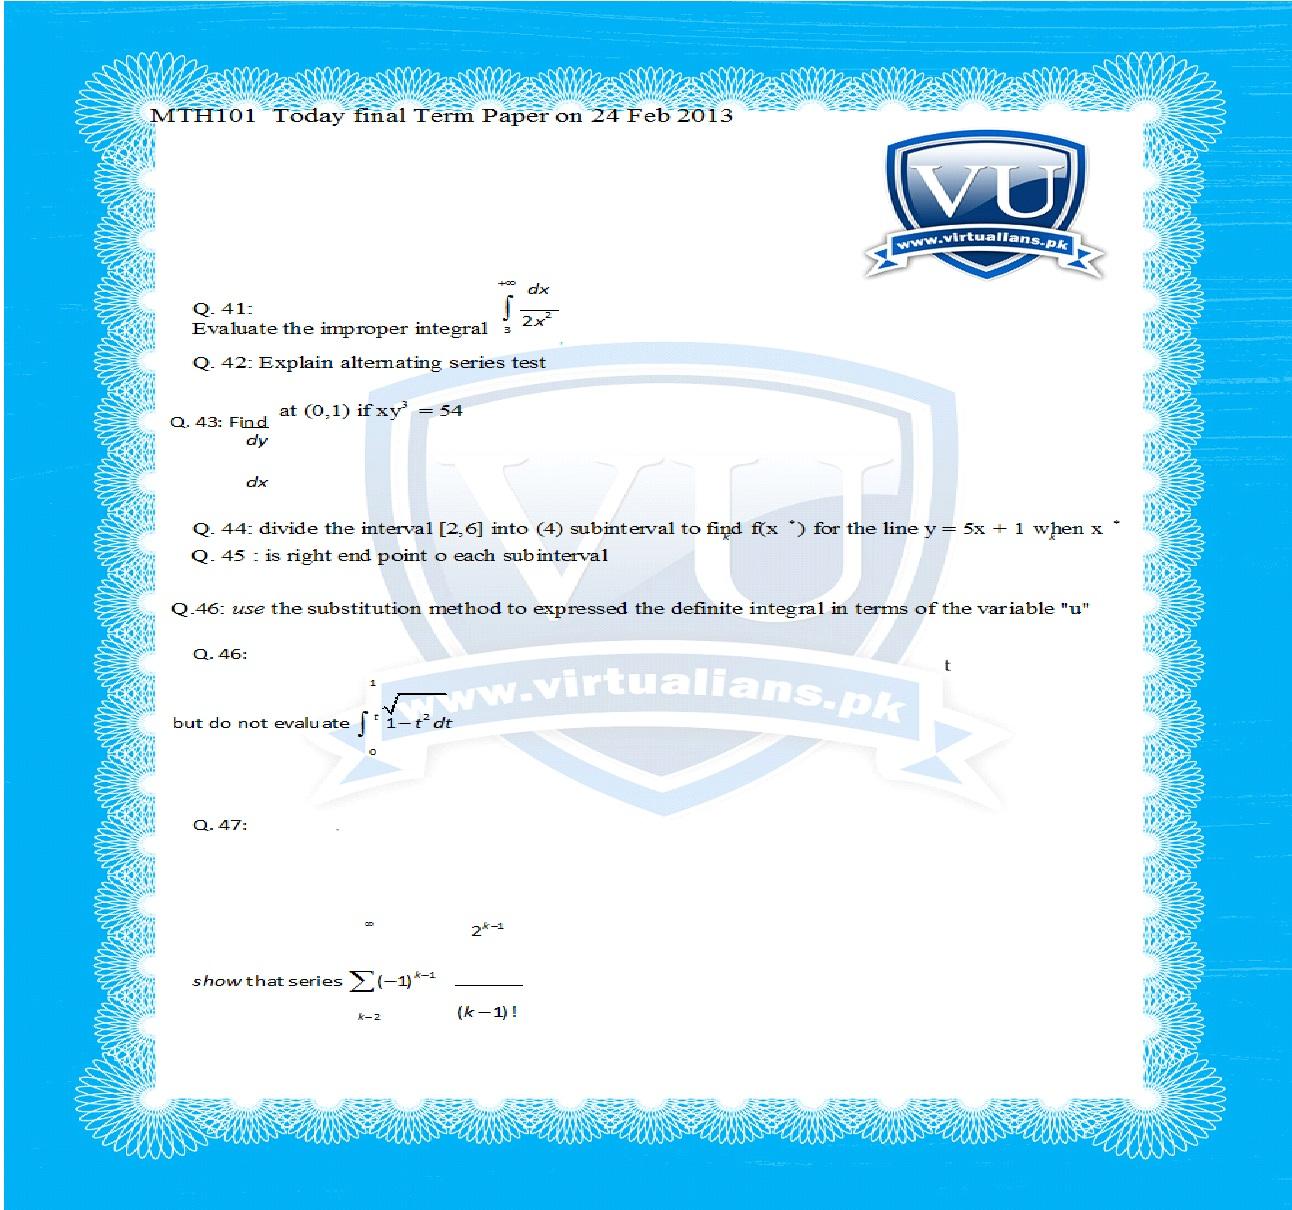 mth101 final term paper 2013